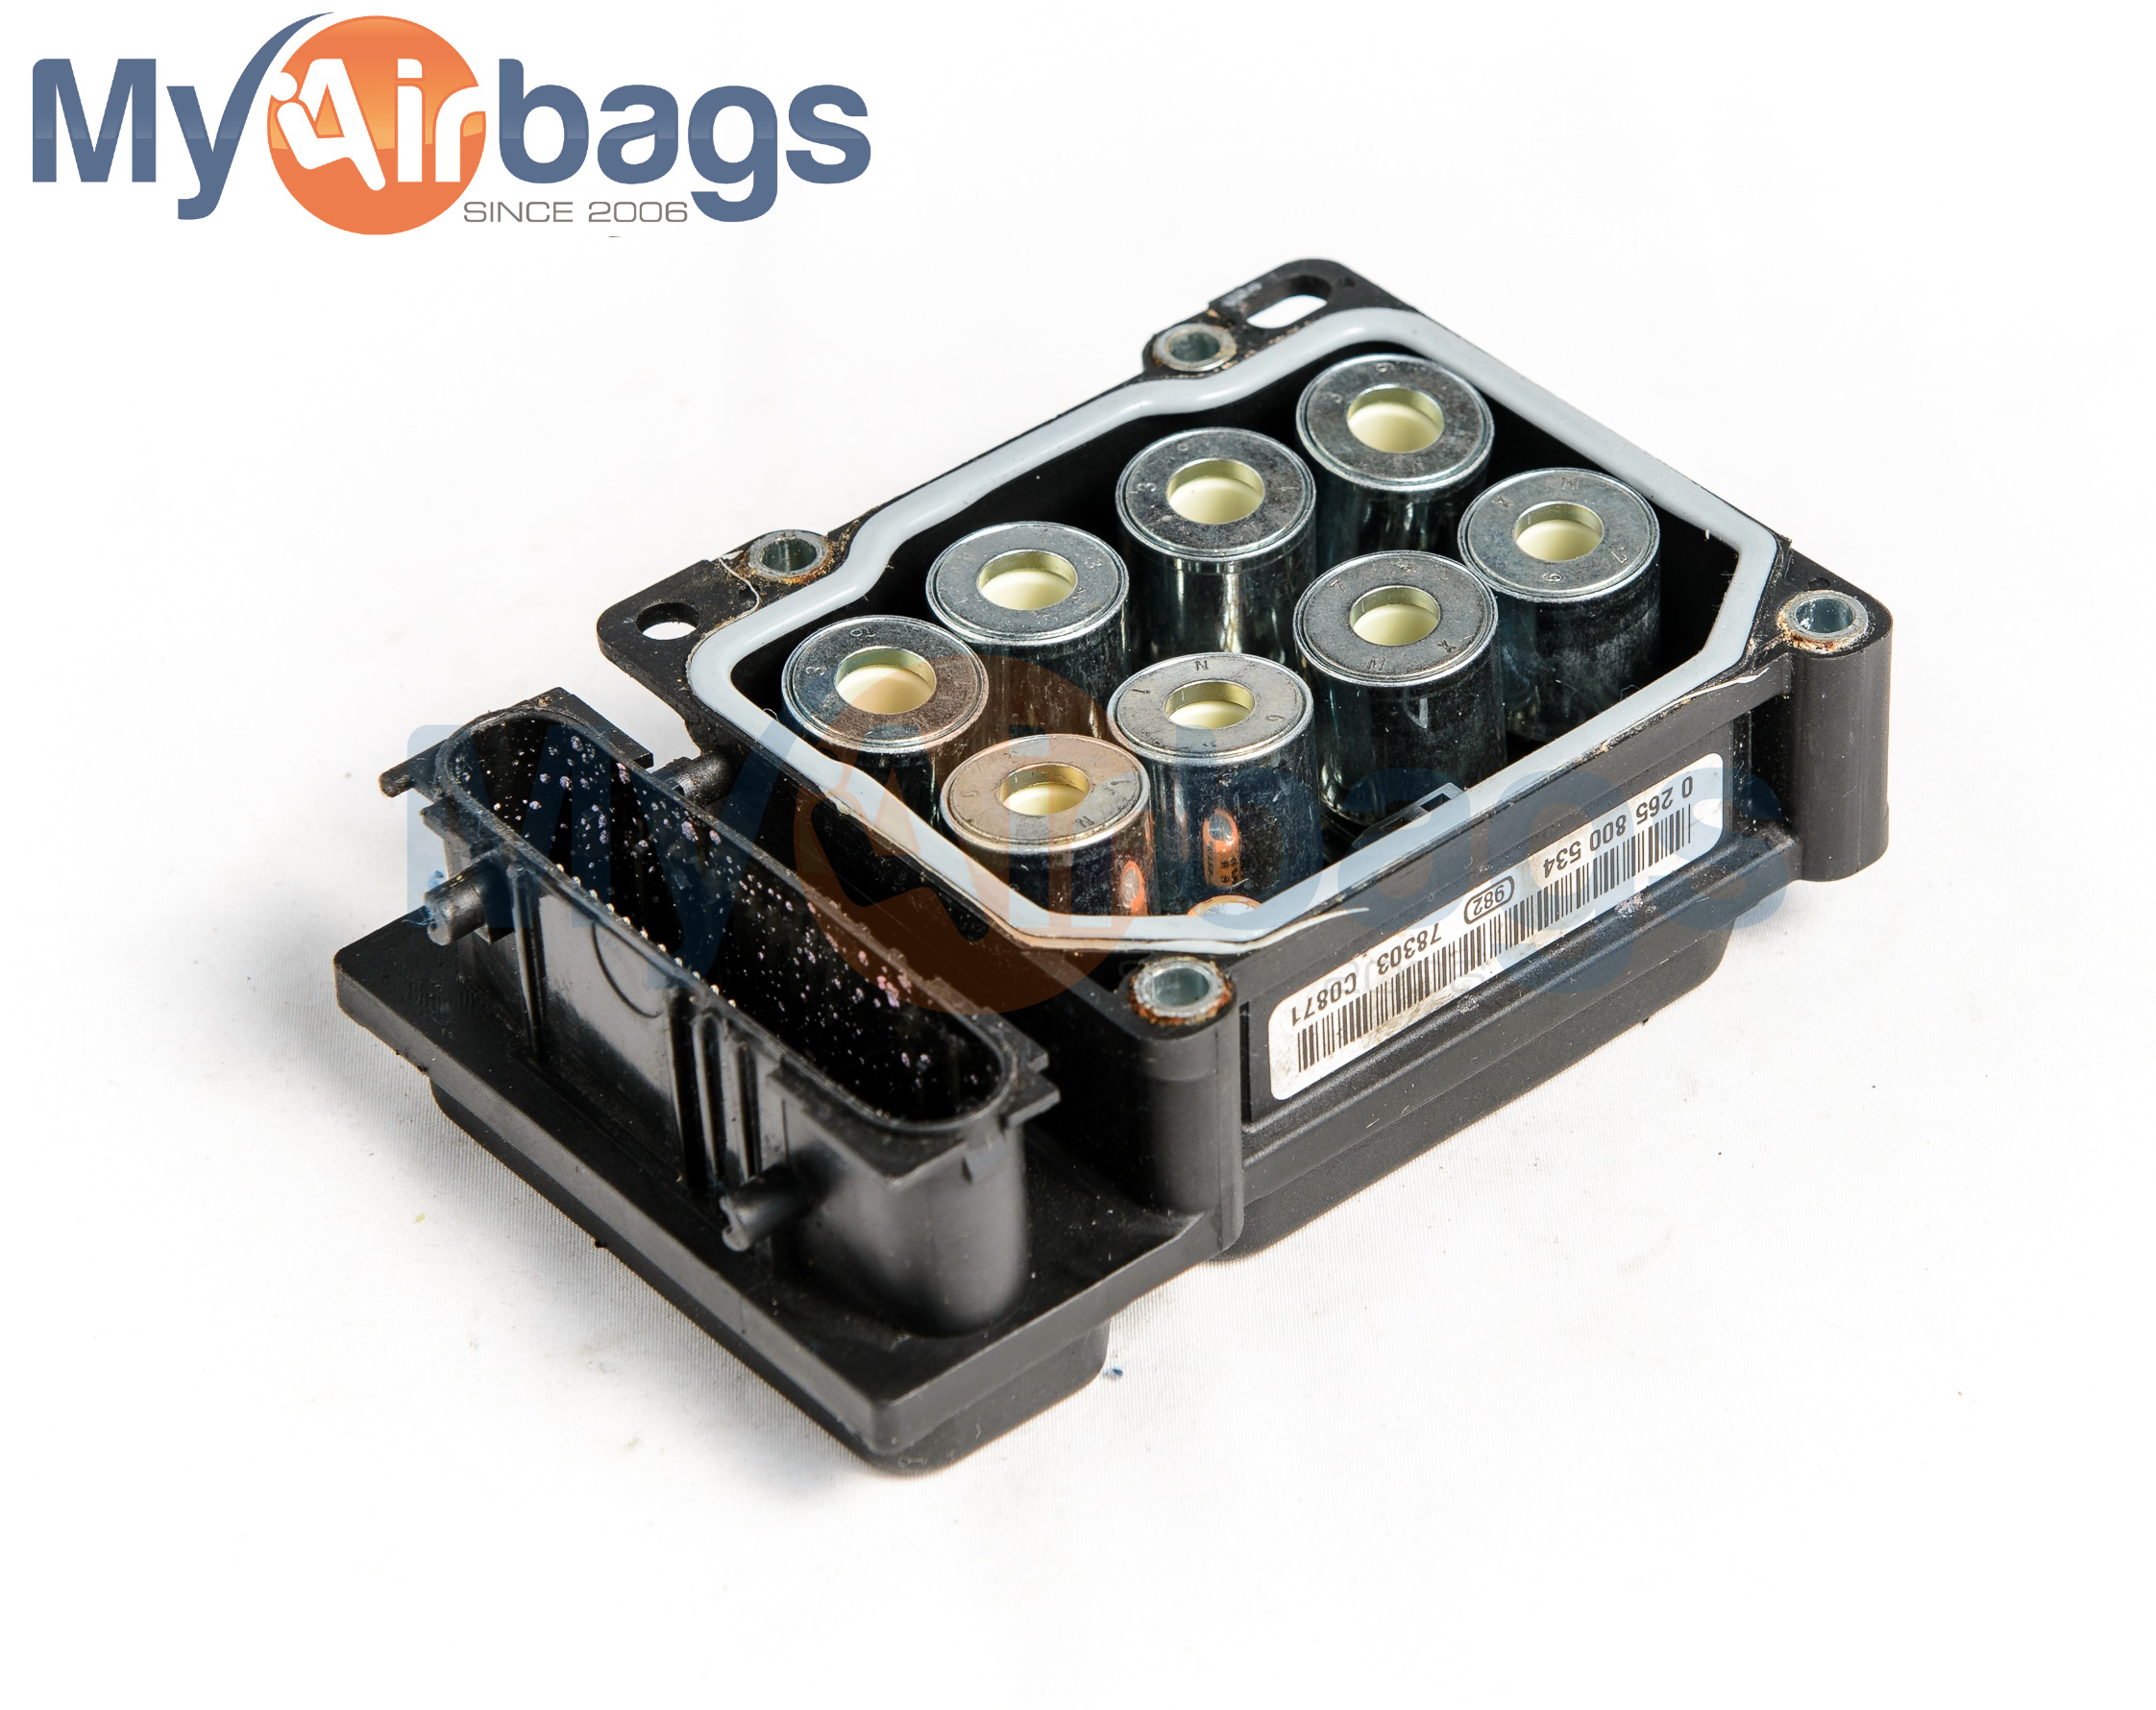 MyAirbags-ABS-Module-BOSCH-8.1-Img1